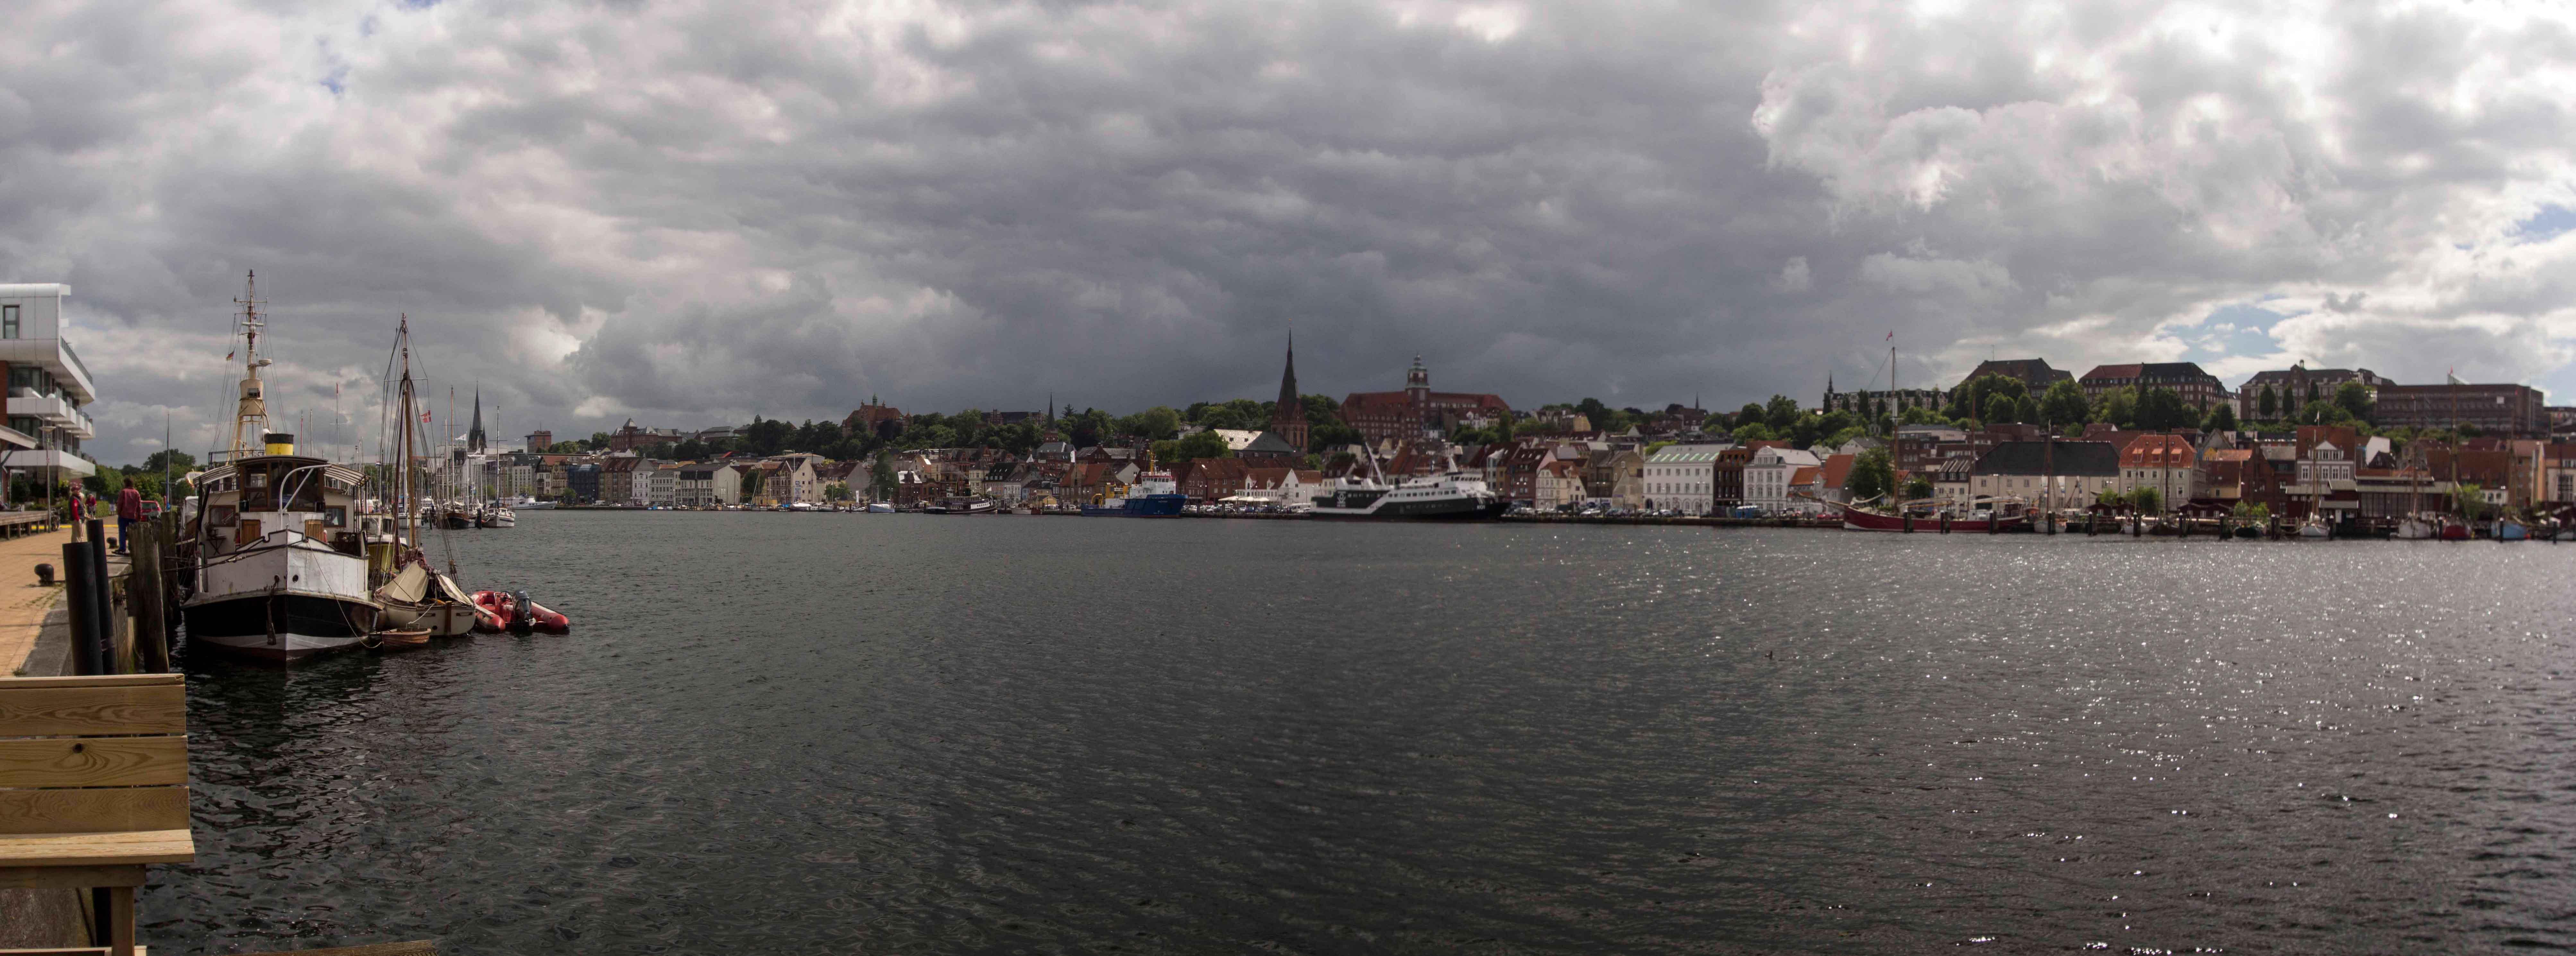 Panorama am Fischereihafen 1